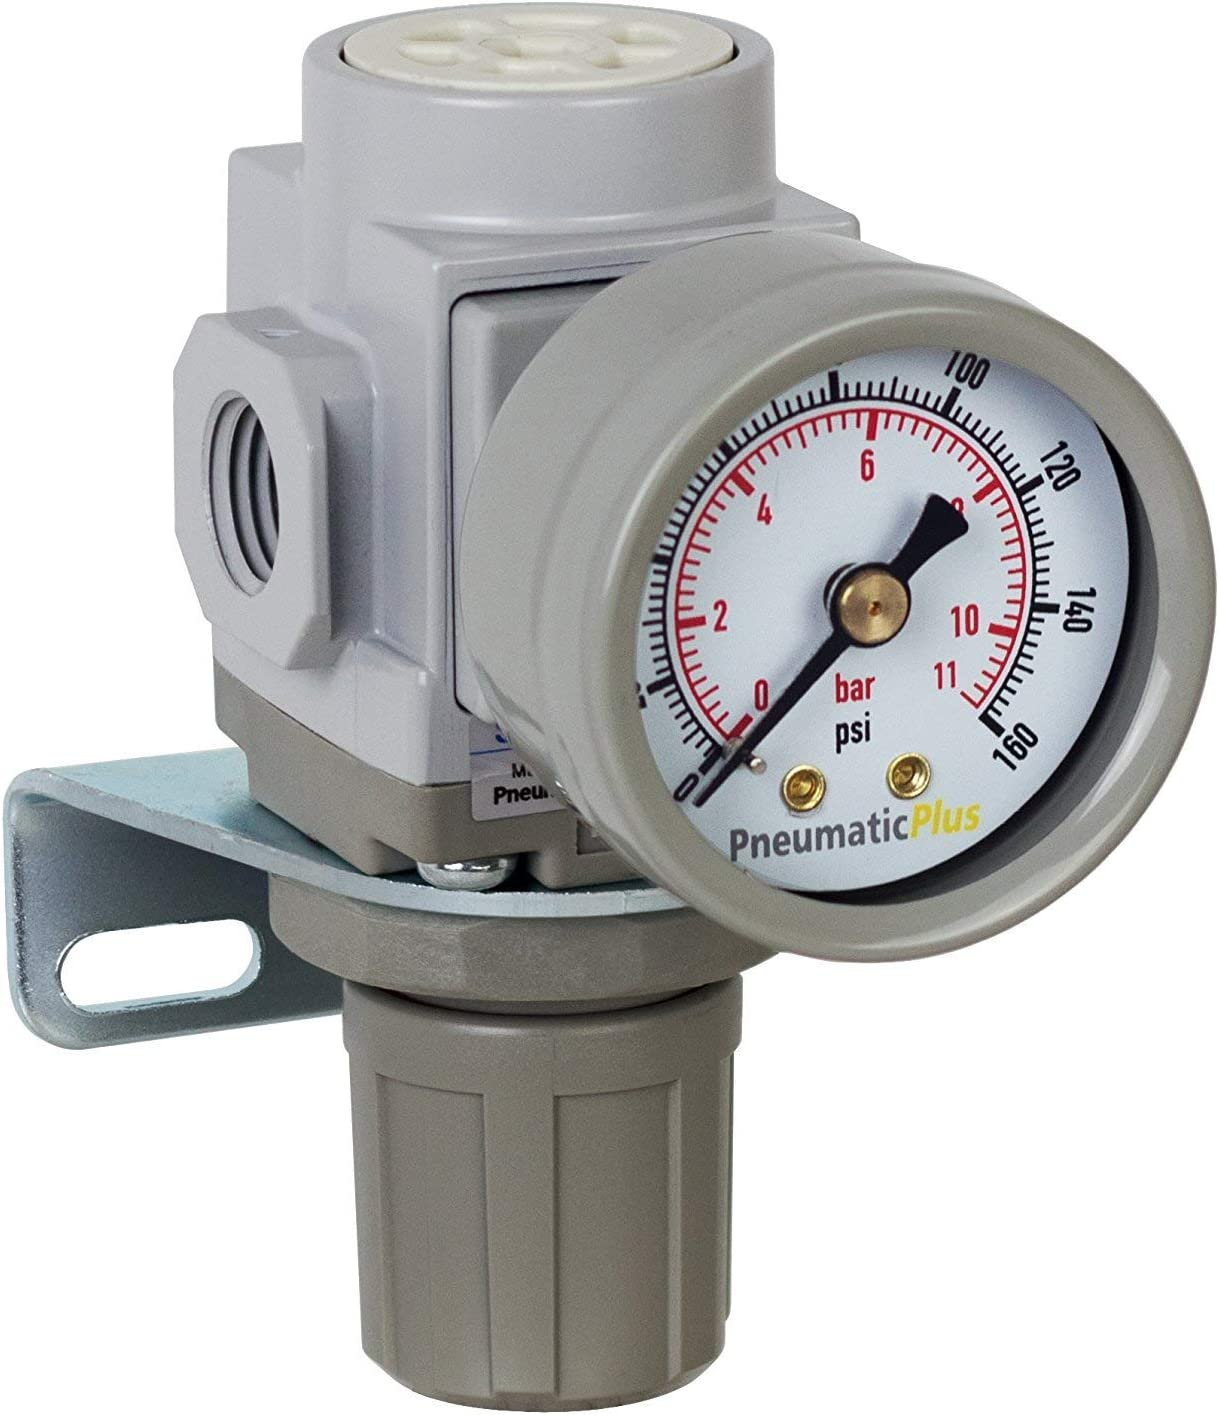 3-60 PSI Bracket Low Pressure PneumaticPlus PPR2-N02BG-4 Miniature Air Pressure Regulator 1//4 NPT Gauge